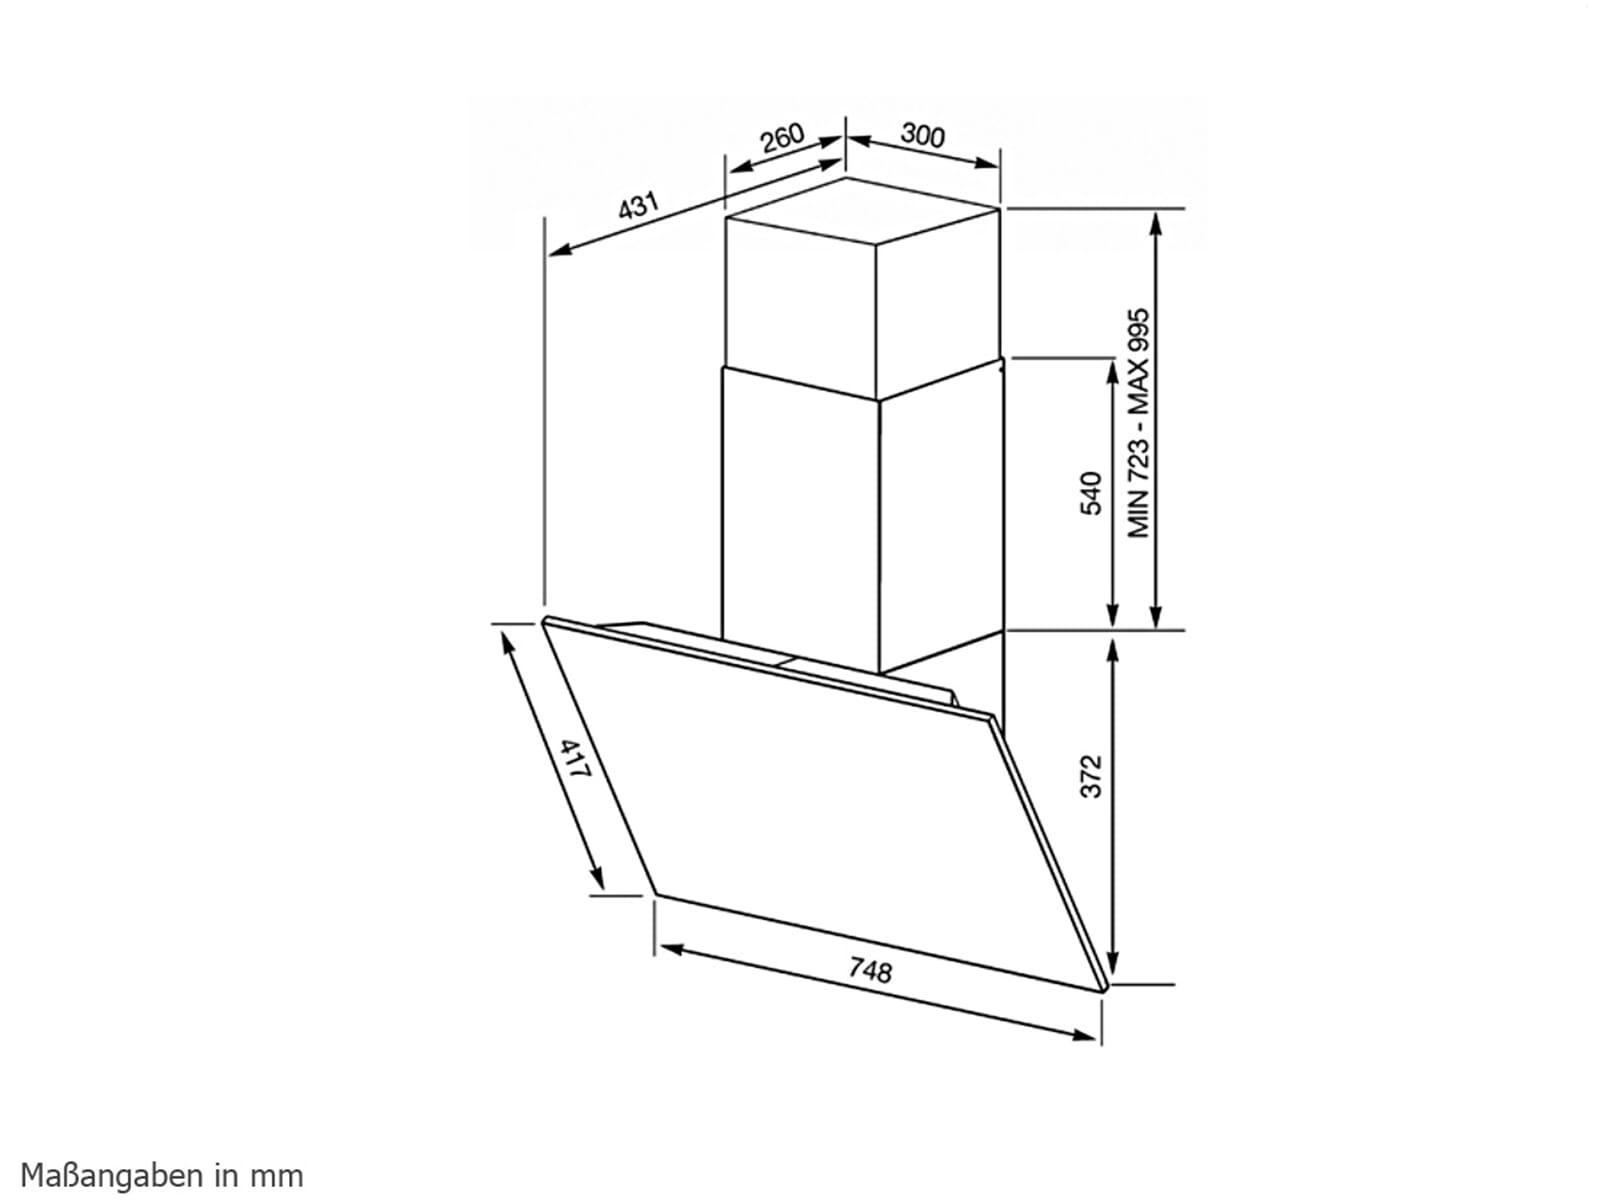 smeg kl175x kopffrei wand dunstabzugshaube edelstahl f r 759 00 eur. Black Bedroom Furniture Sets. Home Design Ideas